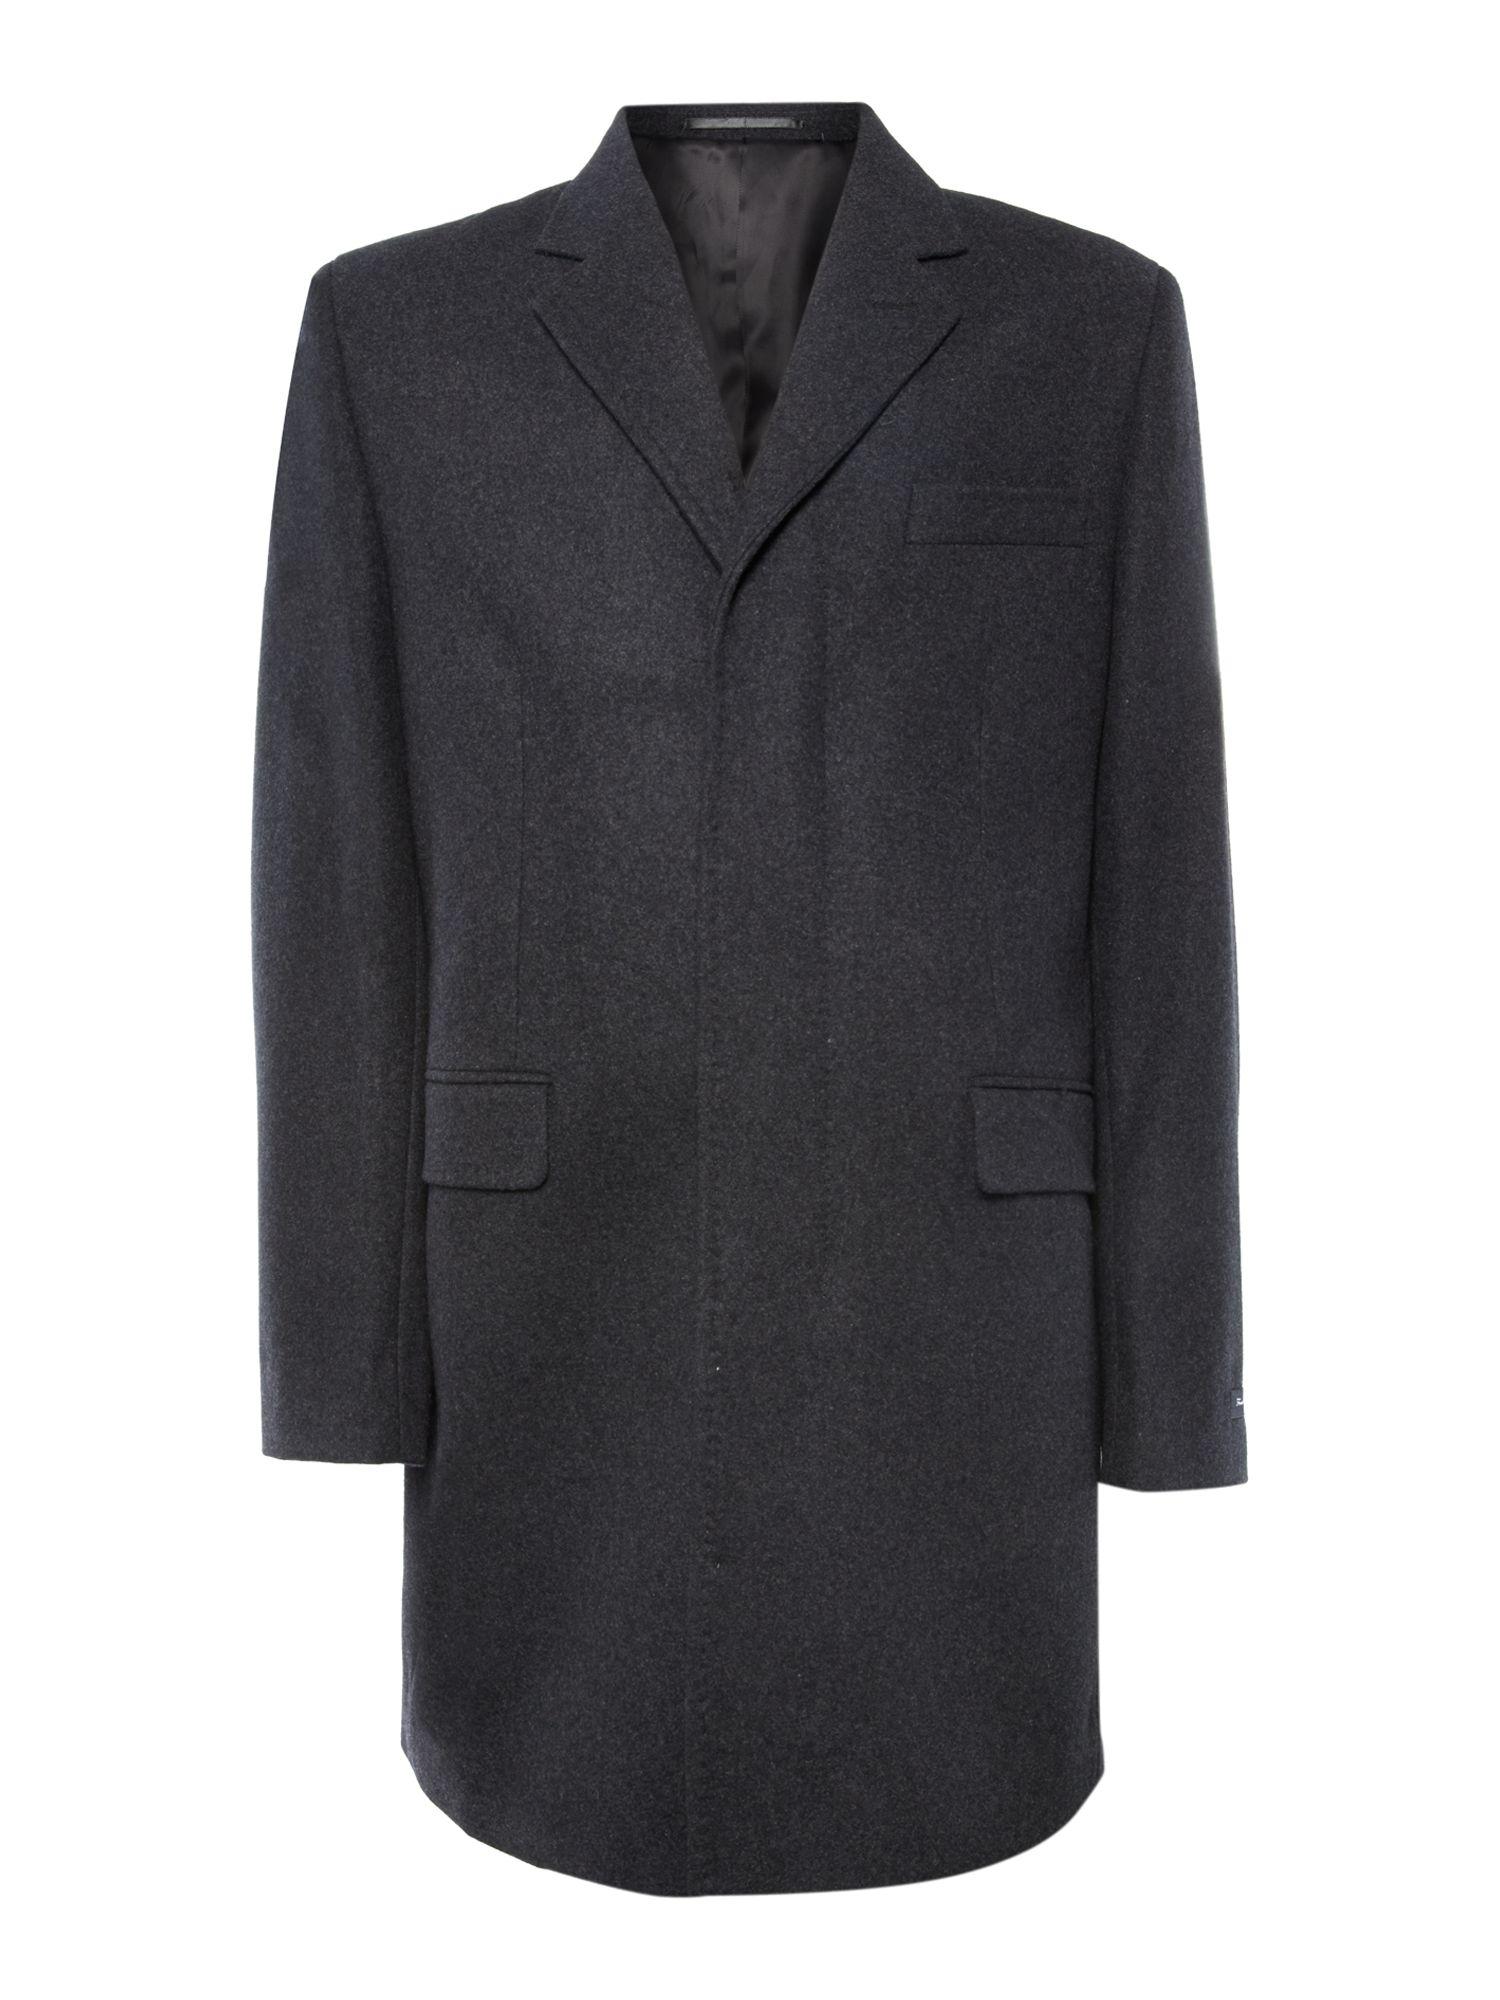 Three-quarter length overcoat